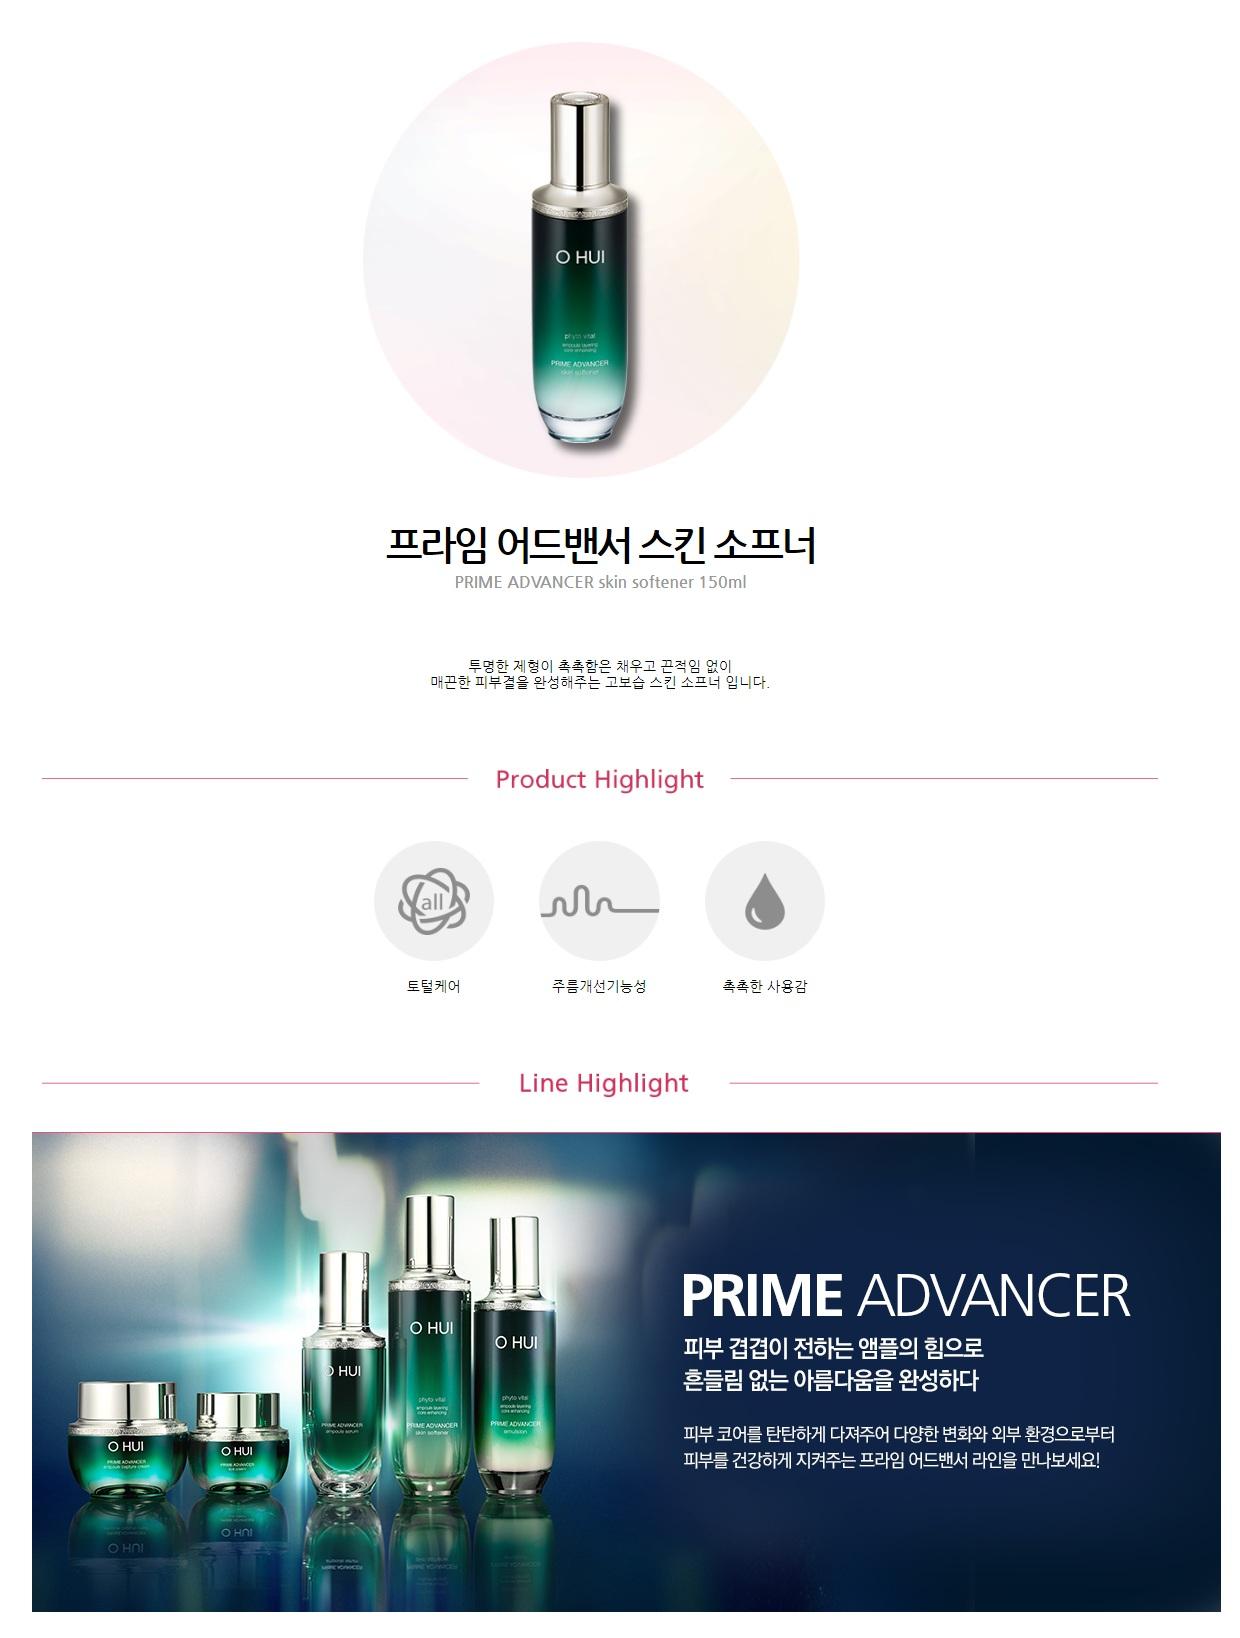 OHUI Prime Advancer Skin Softener 150ml